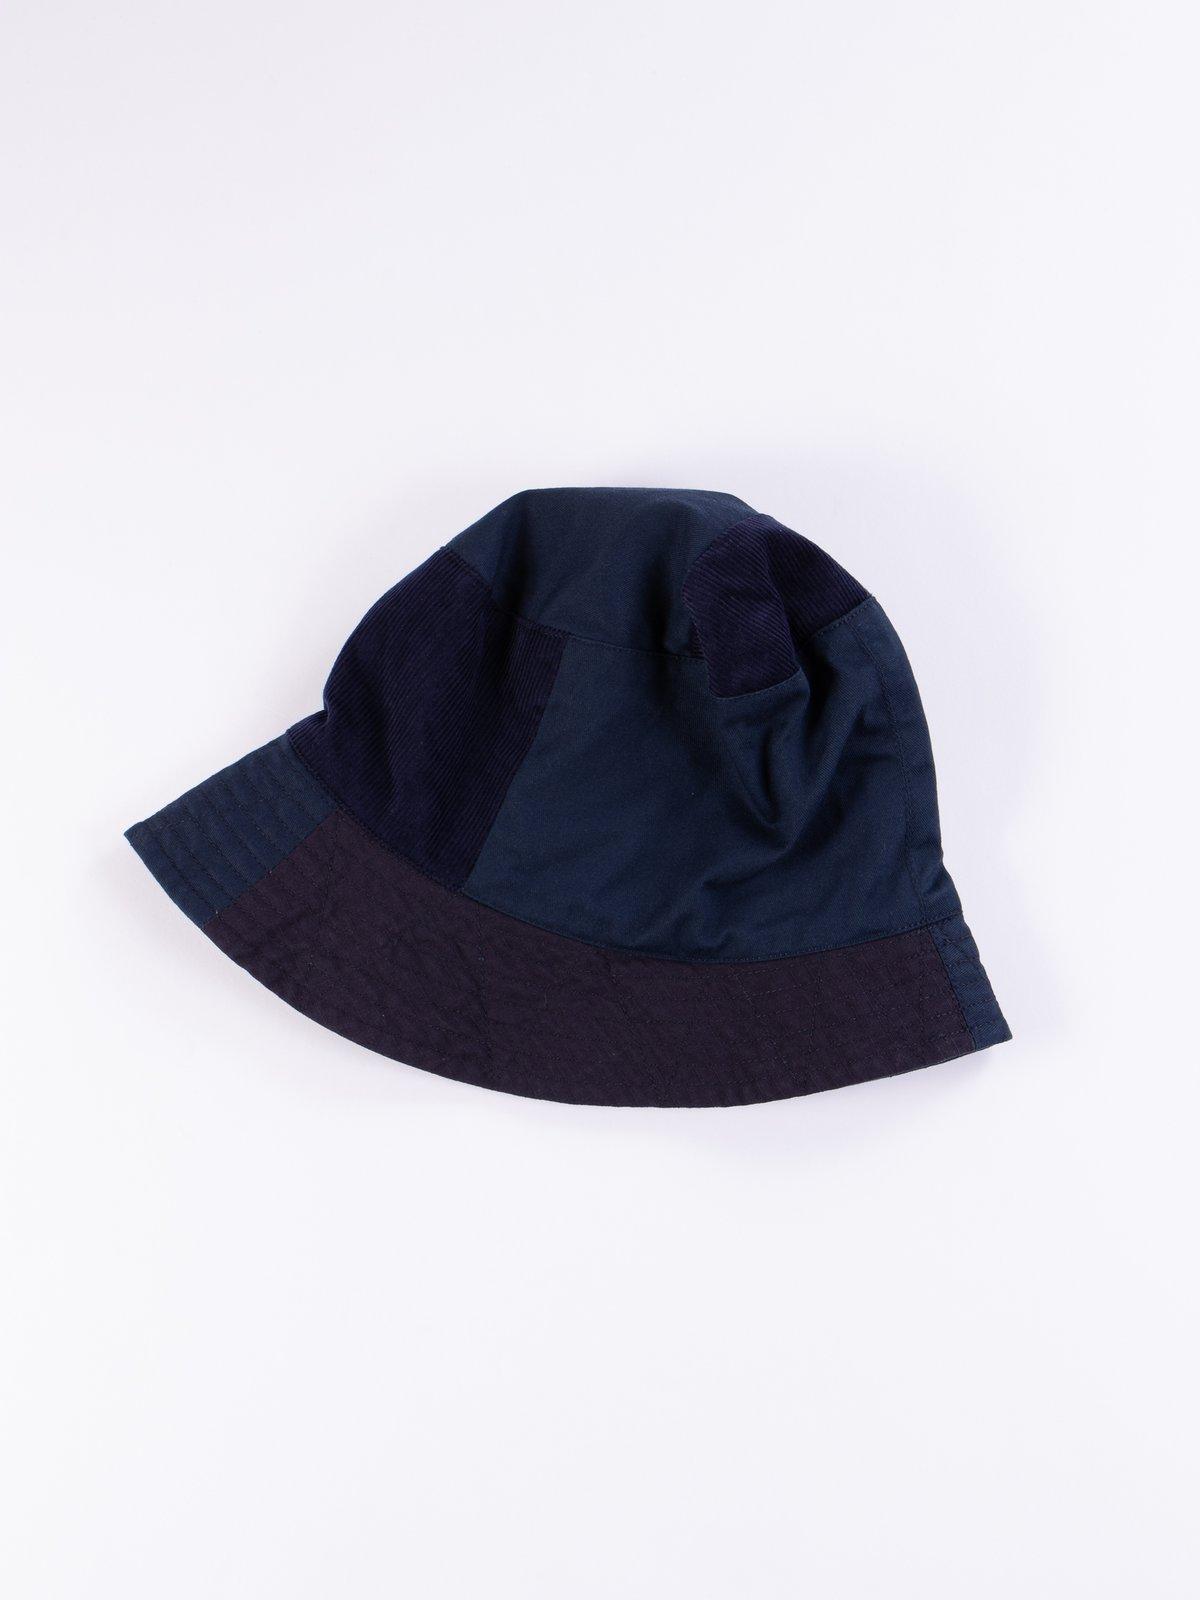 52b9582099b94 Navy 6.5oz Flat Twill Bucket Hat by Engineered Garments – The Bureau ...